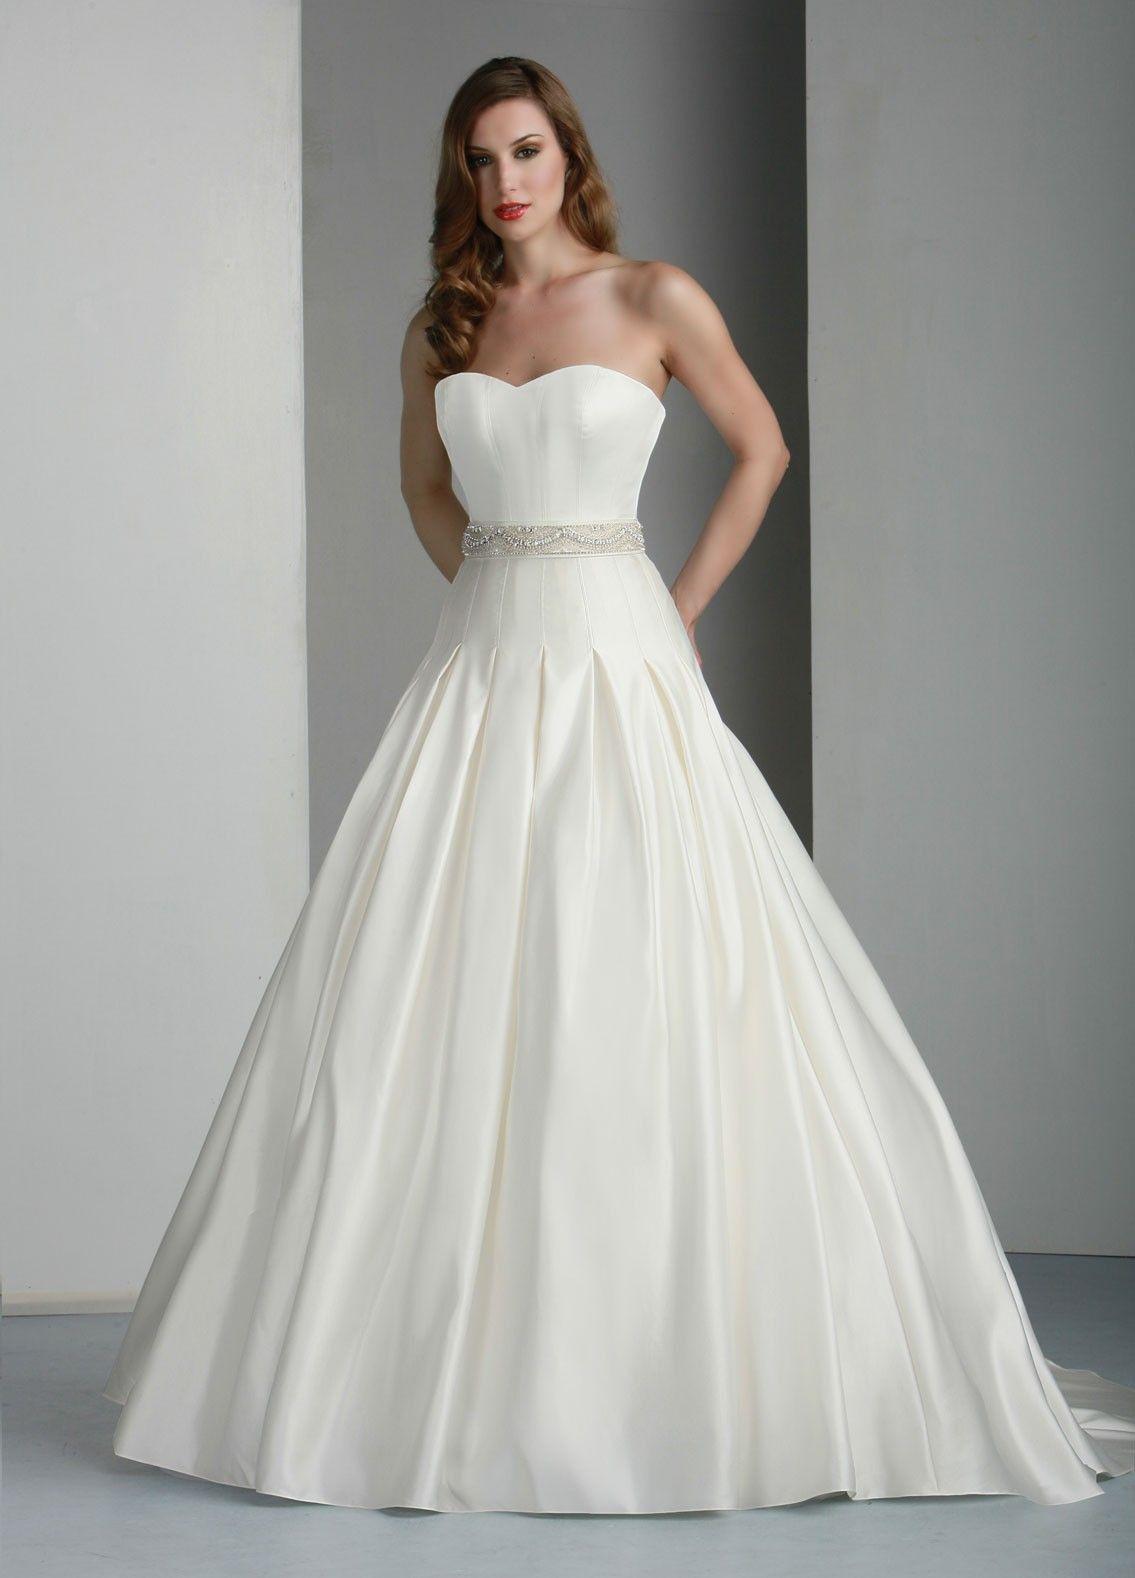 one of my dream dresses.   Wedding Dresses   Pinterest   Strapless ...